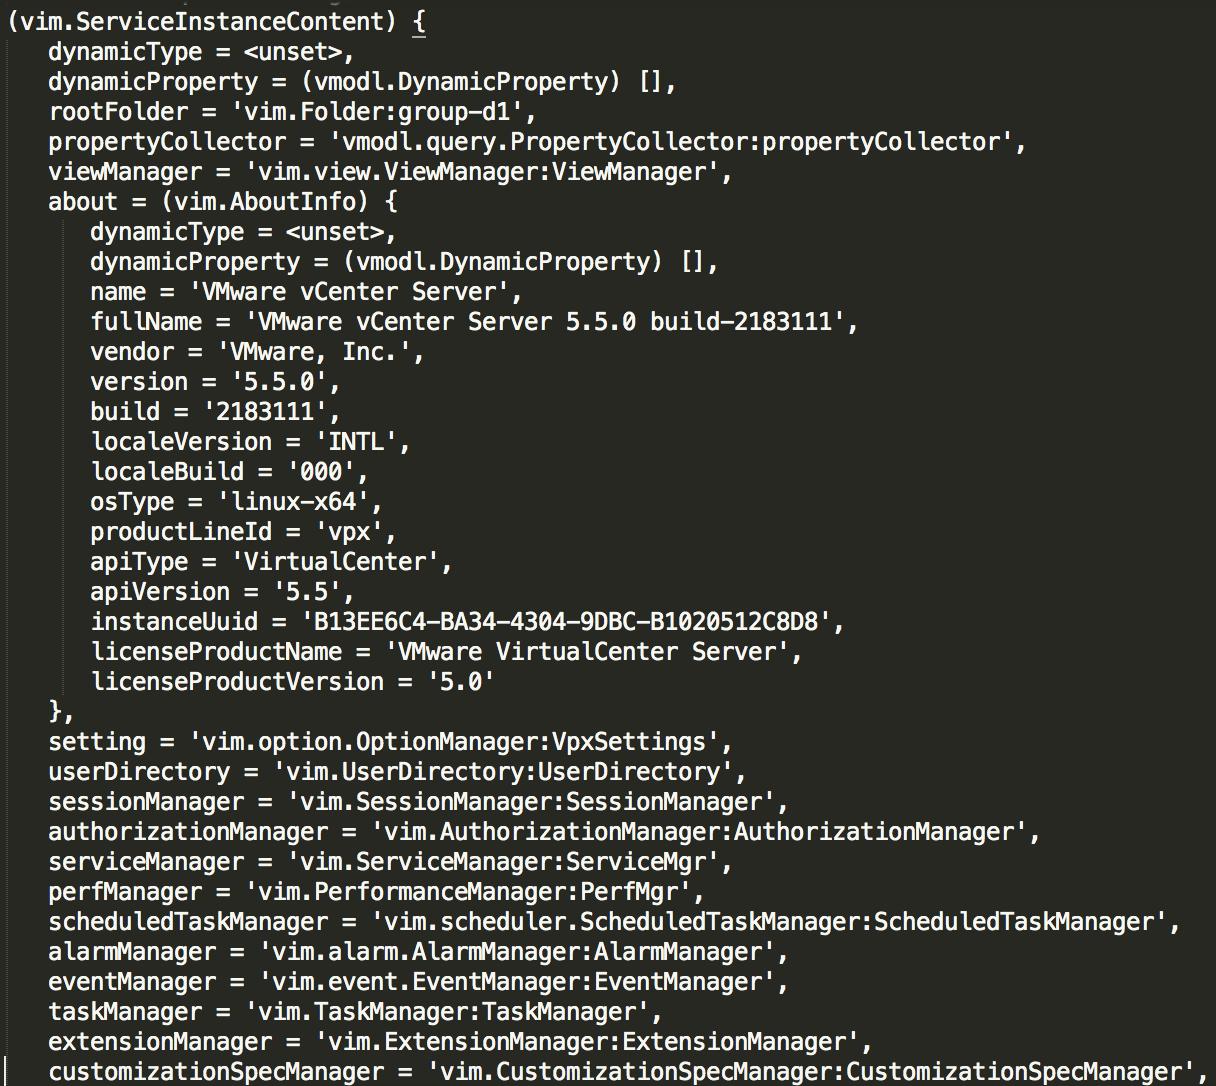 VMware vSphere v5 #-v6 # - Enhanced LACP Configuration via